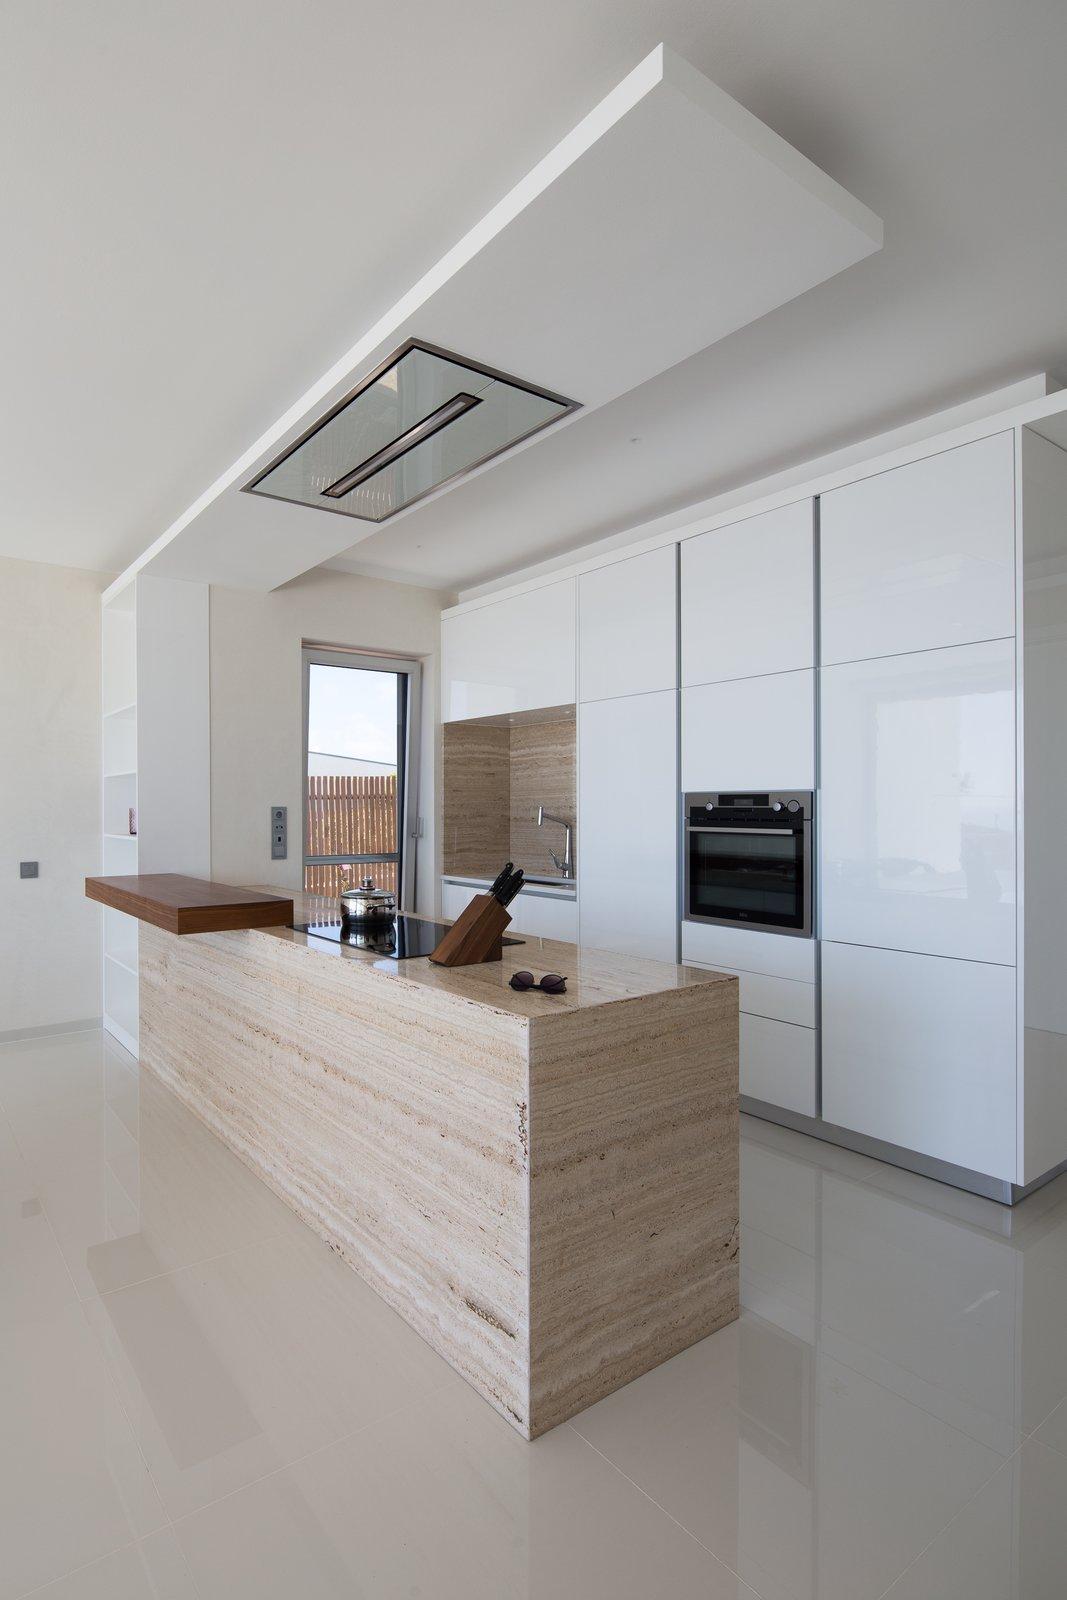 Villa GK kitchen with travertine peninsula